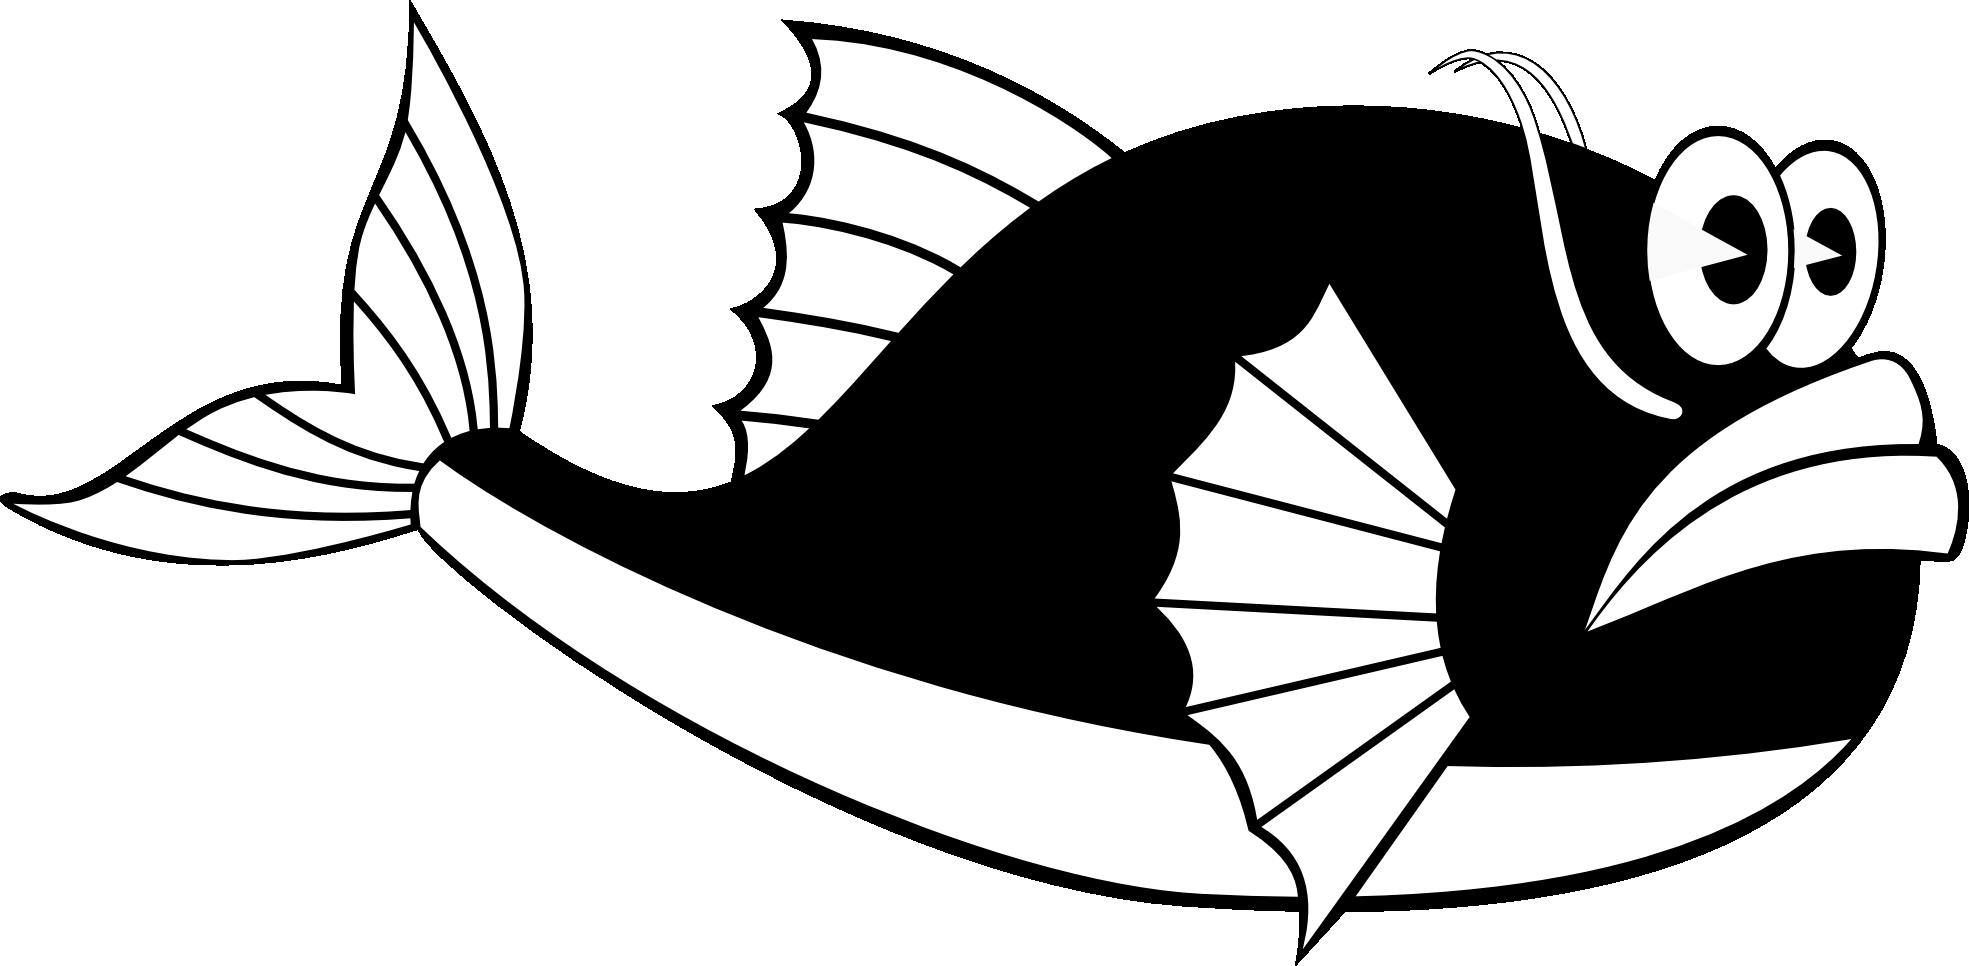 Whale Clip Art Black And White.